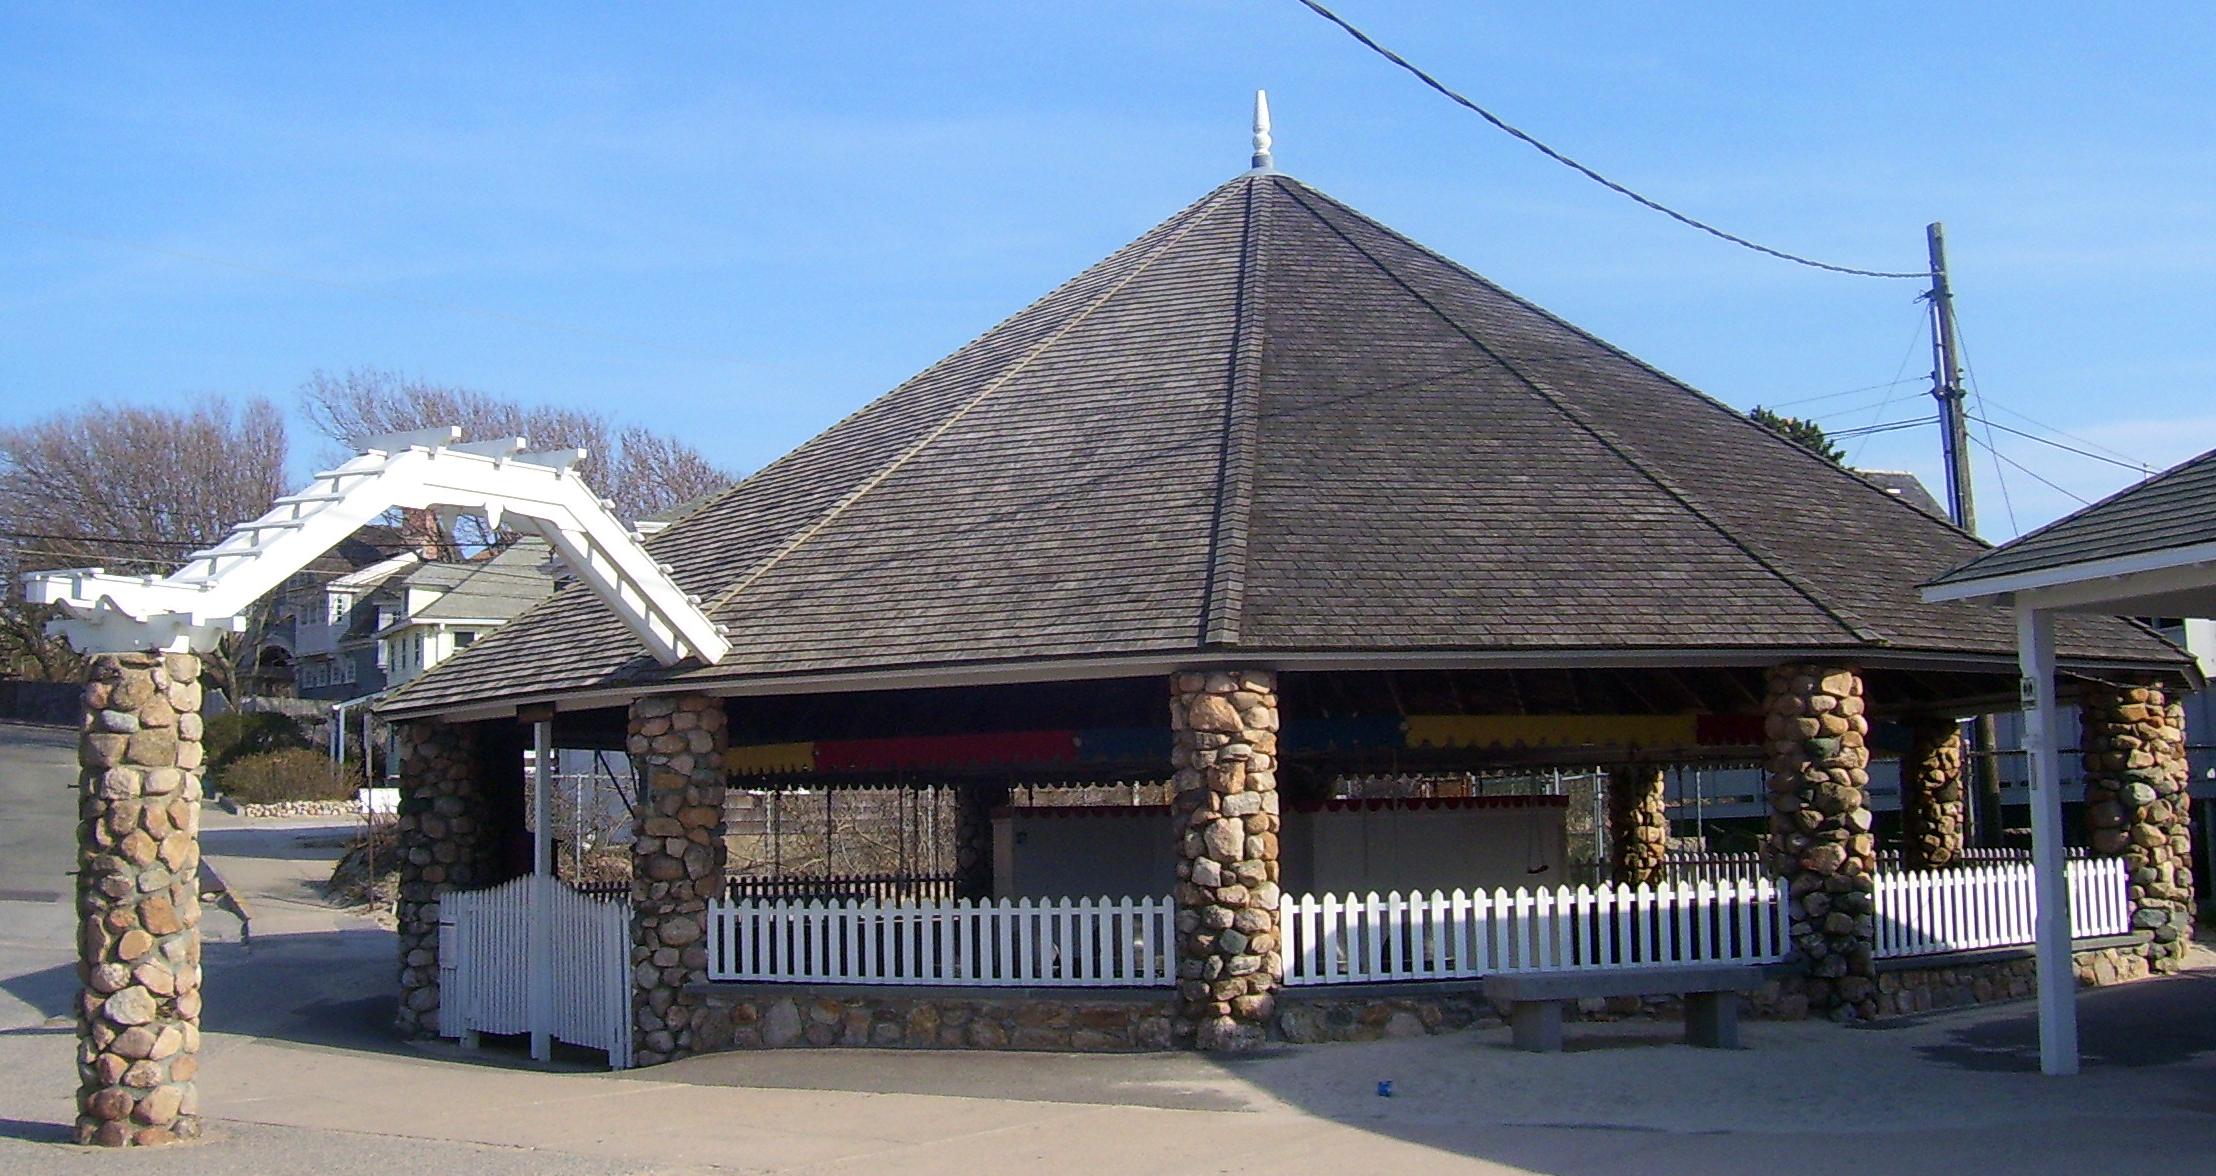 Flying Horse Carousel In Rhode Island